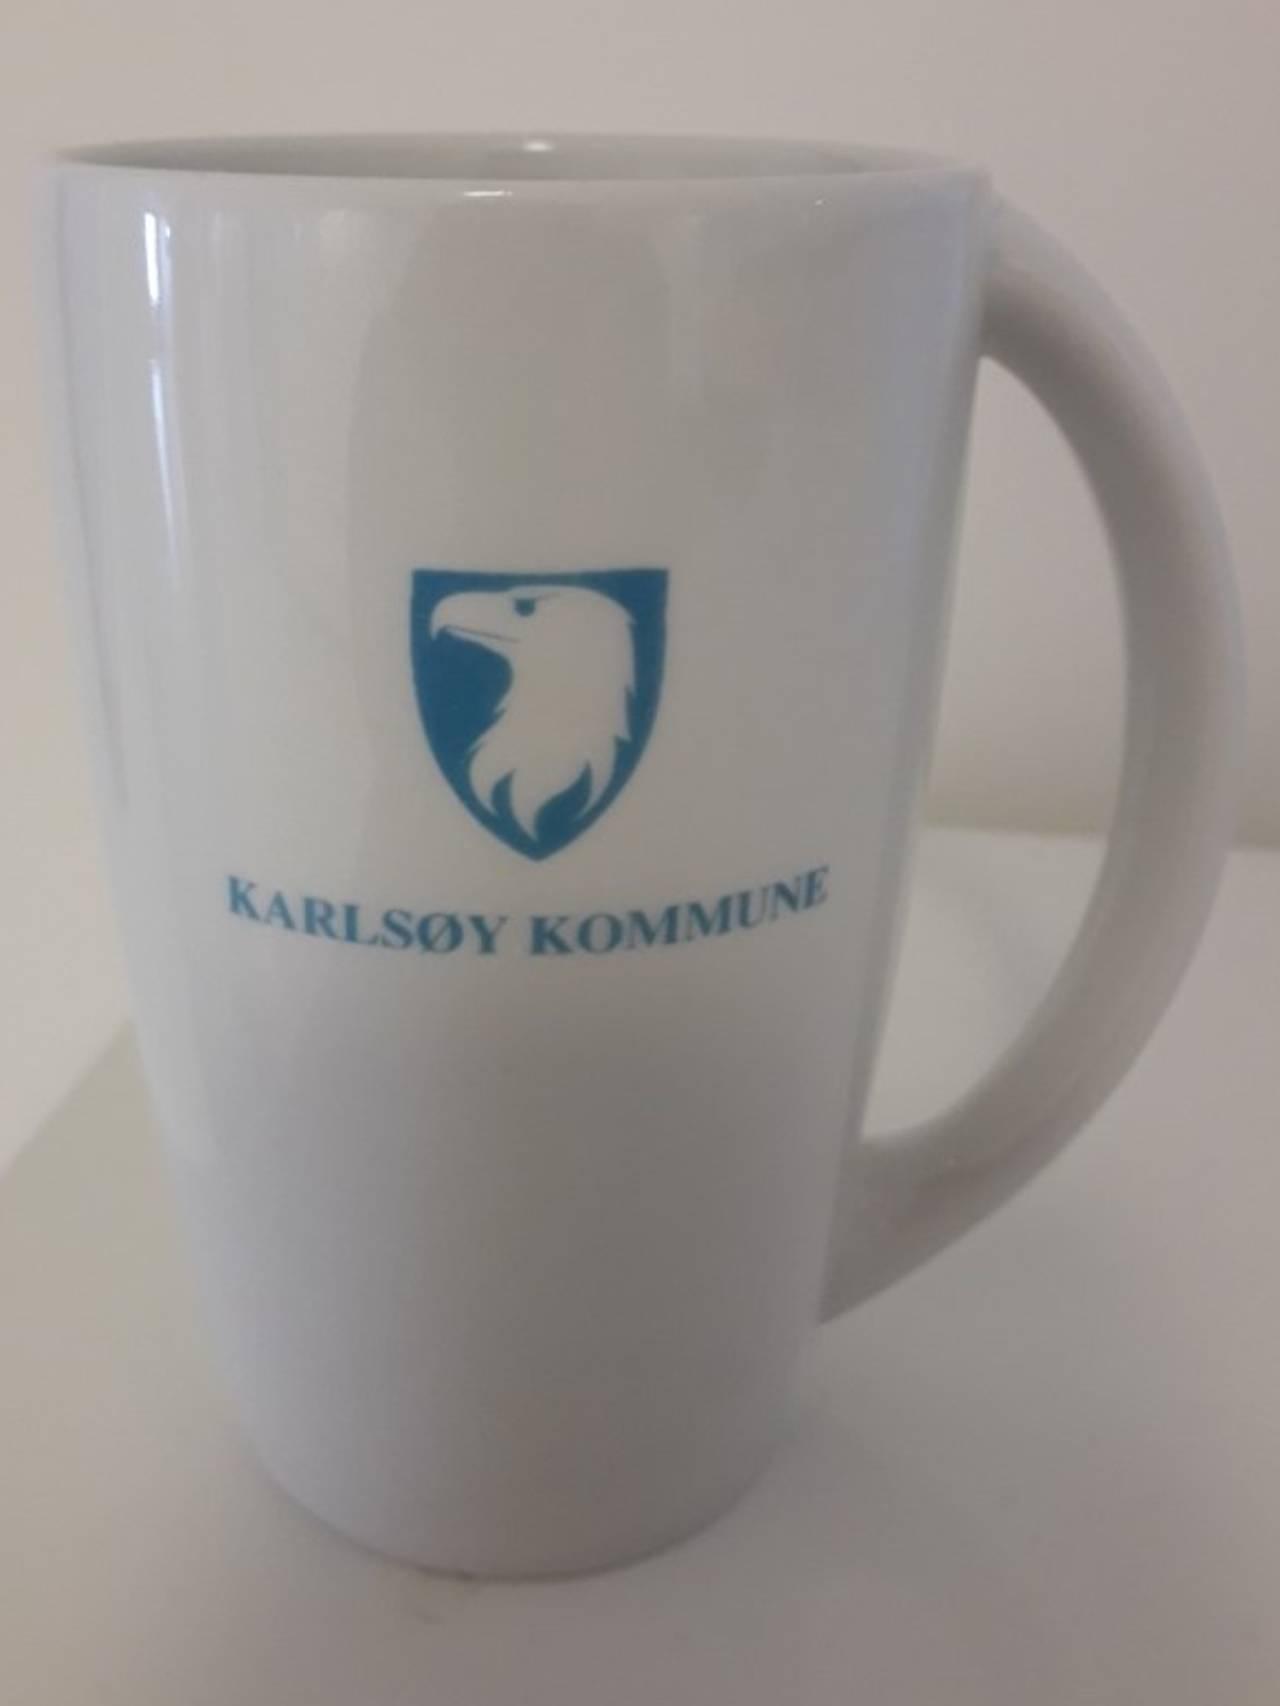 Karlsøy kommune sitt krus